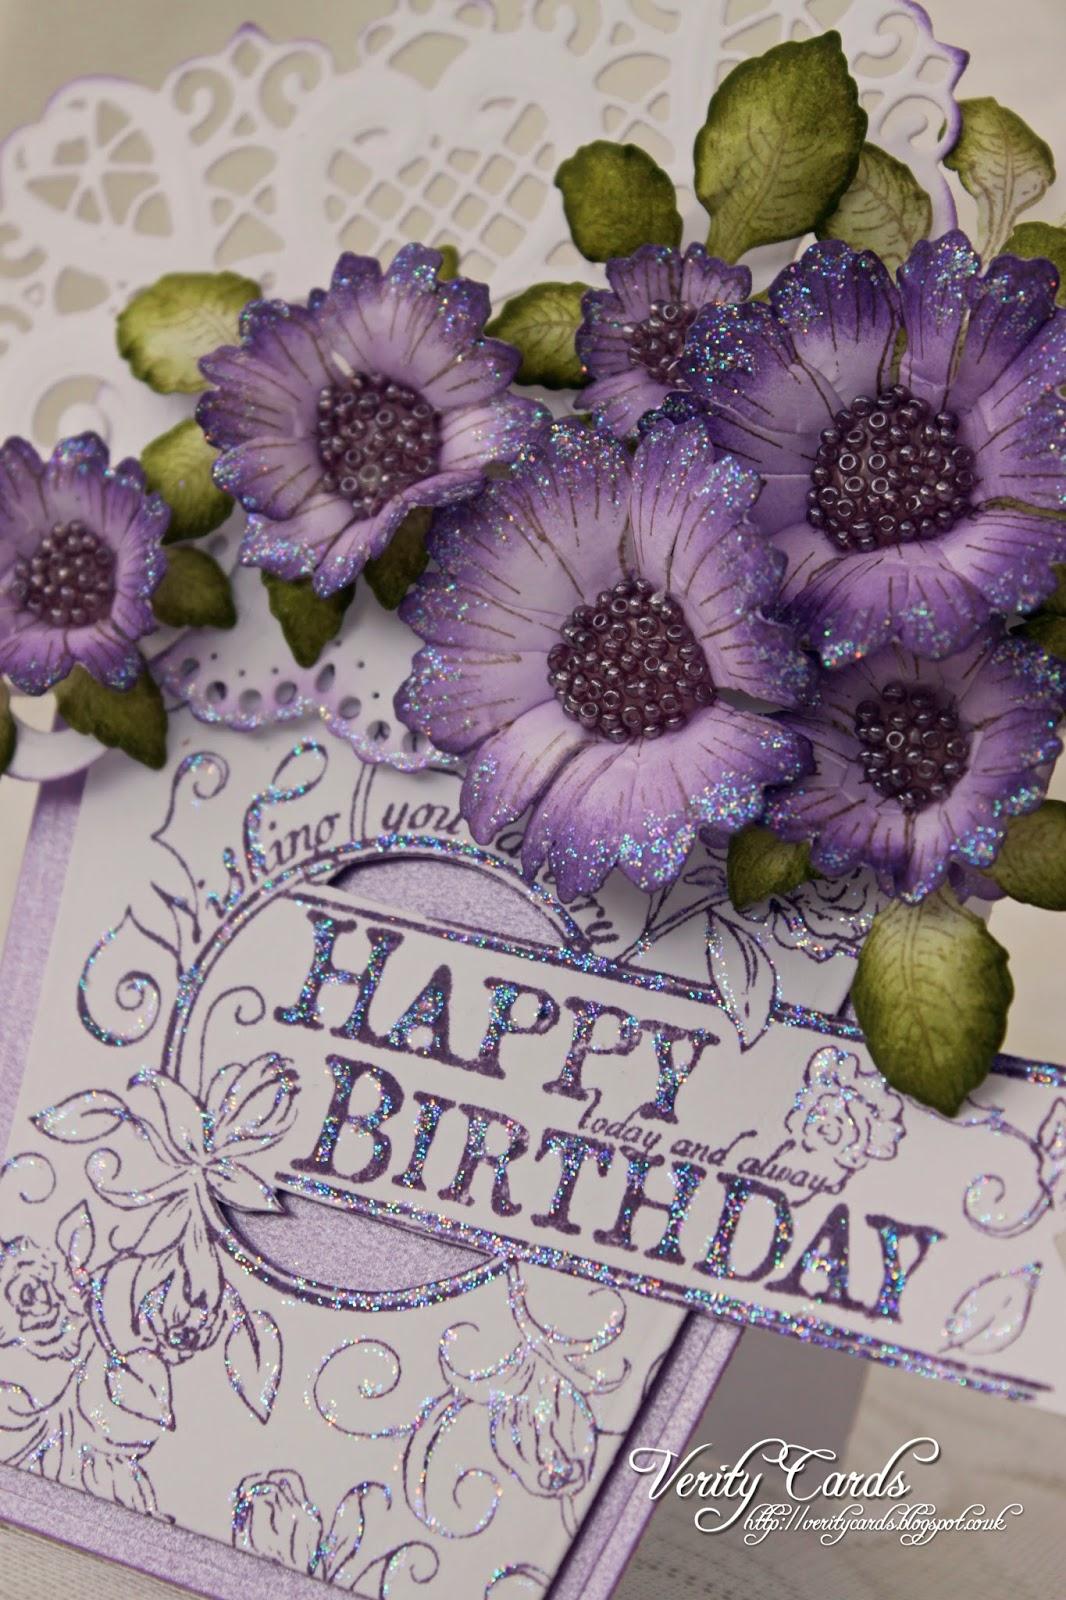 Verity Cards Birthday Flowers